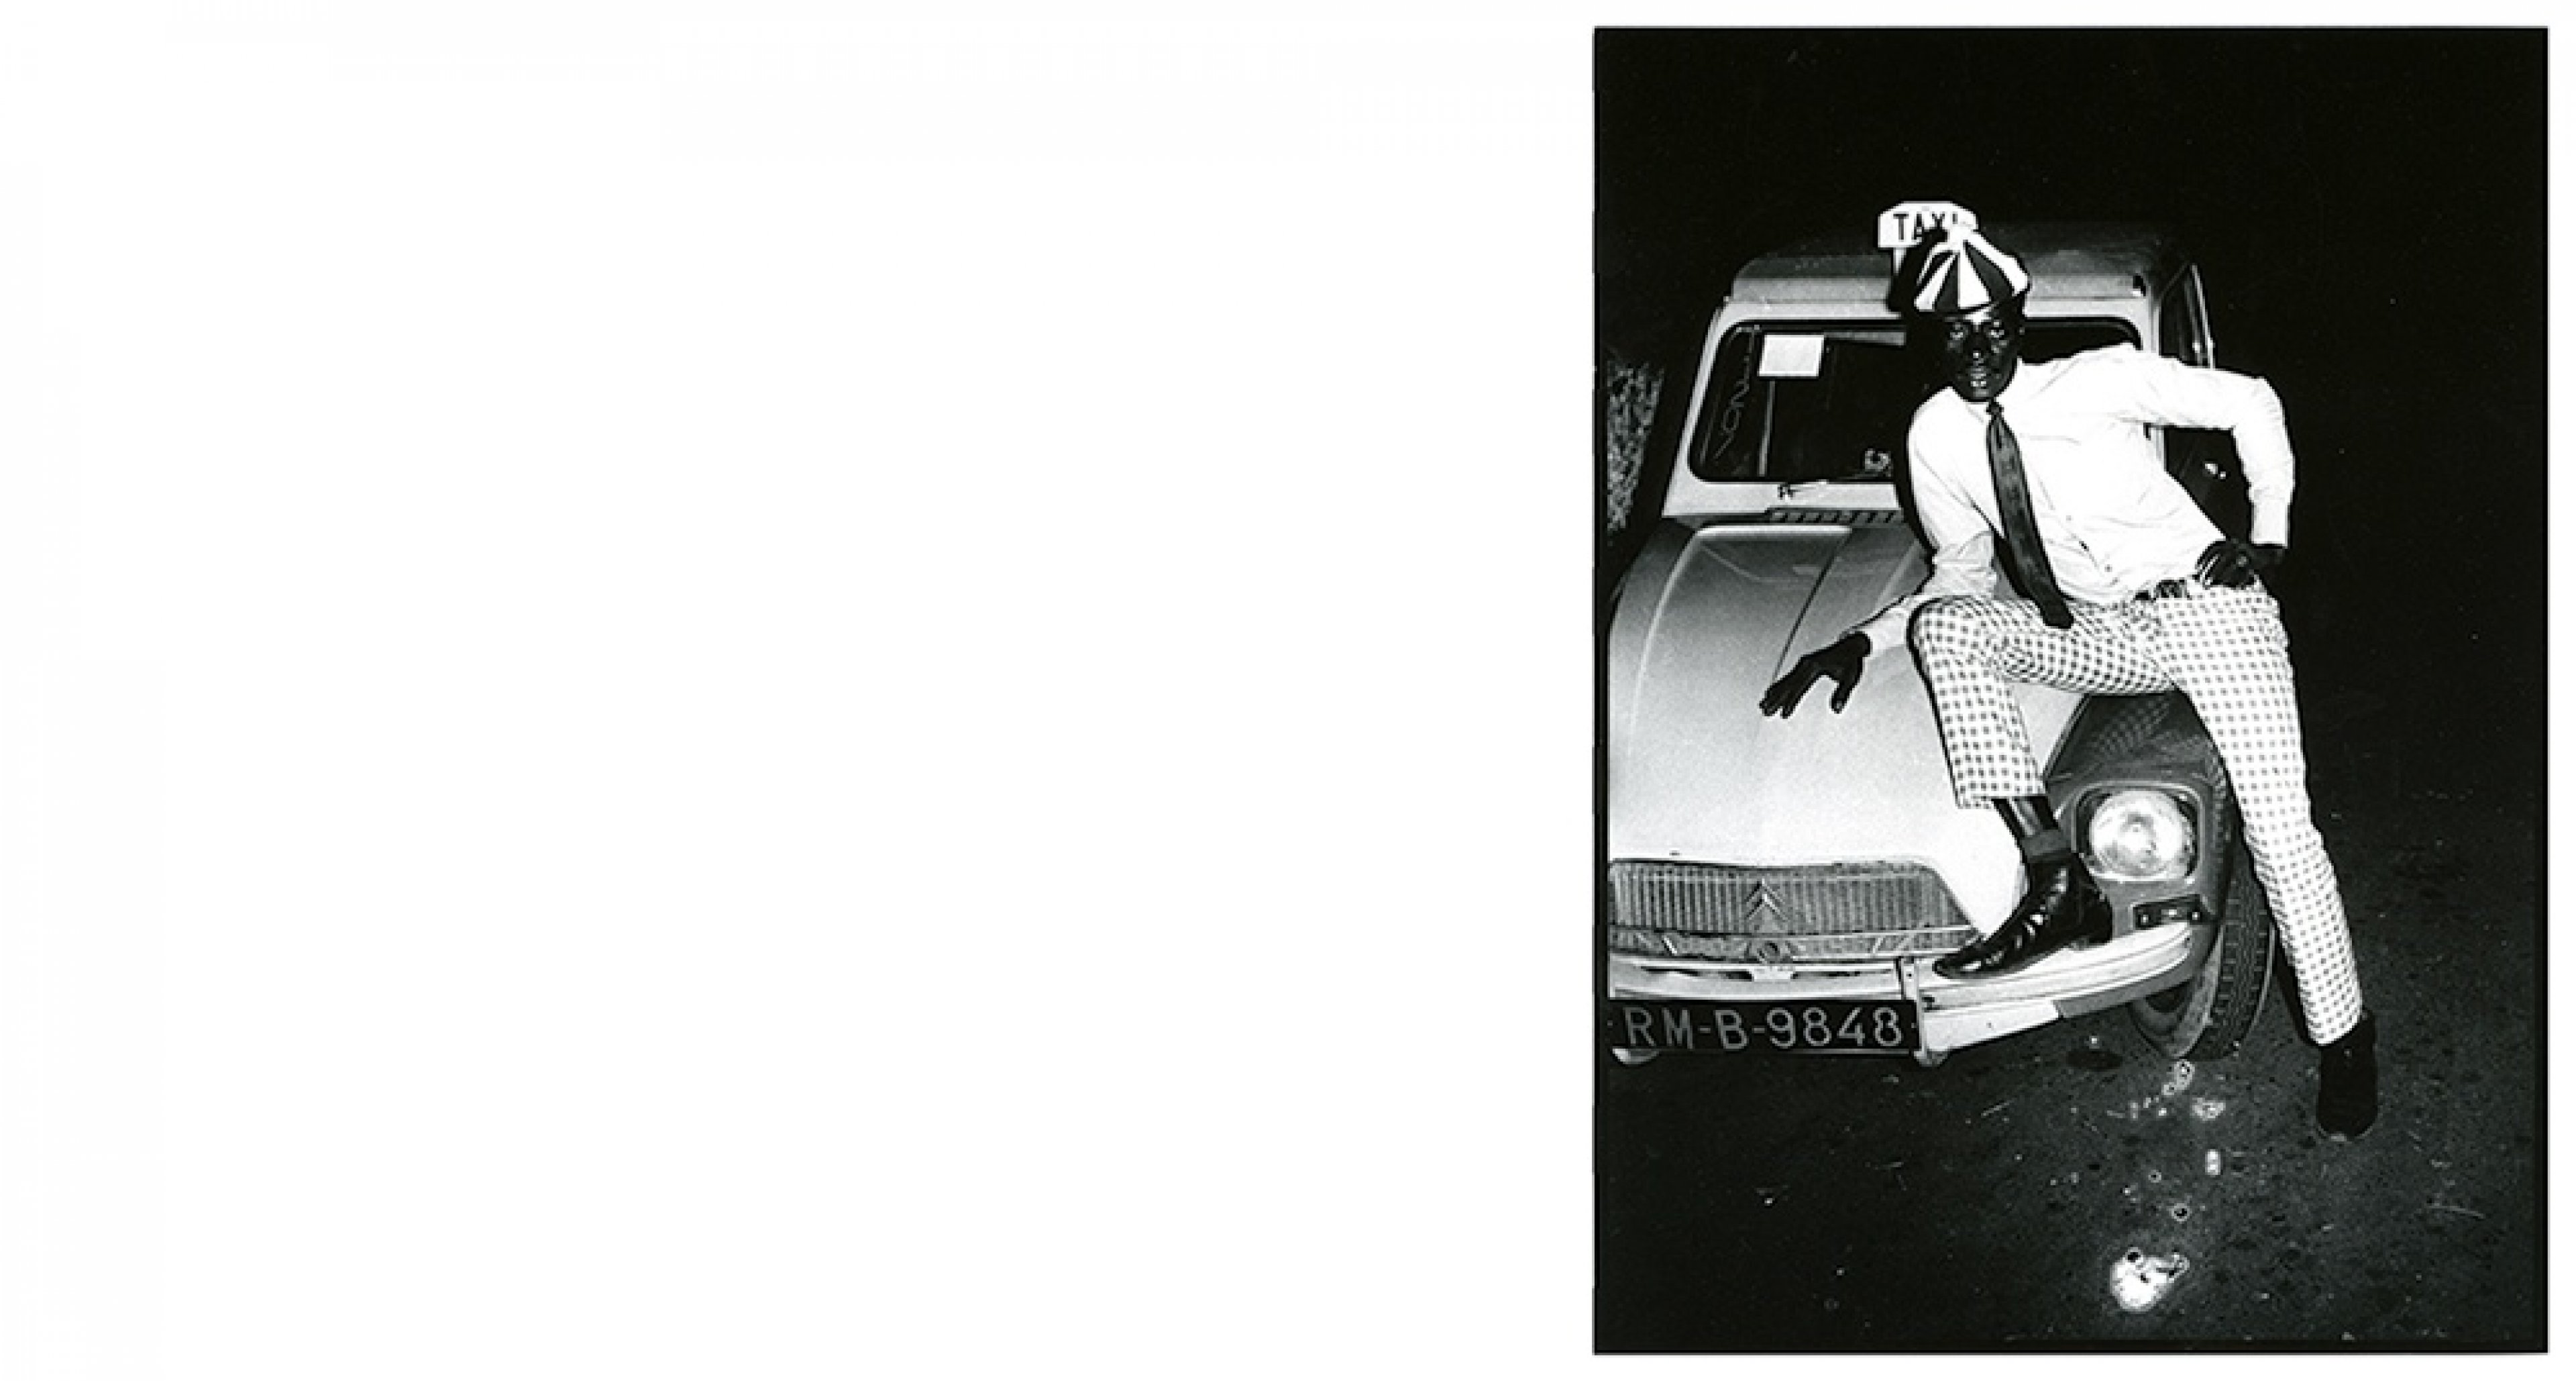 Malick Sidibé, Taximan avec voiture, 1970 Gelatin silver print, 40 x 30 cm Courtesy Galerie Magnin-A, Paris © Malick Sidibé